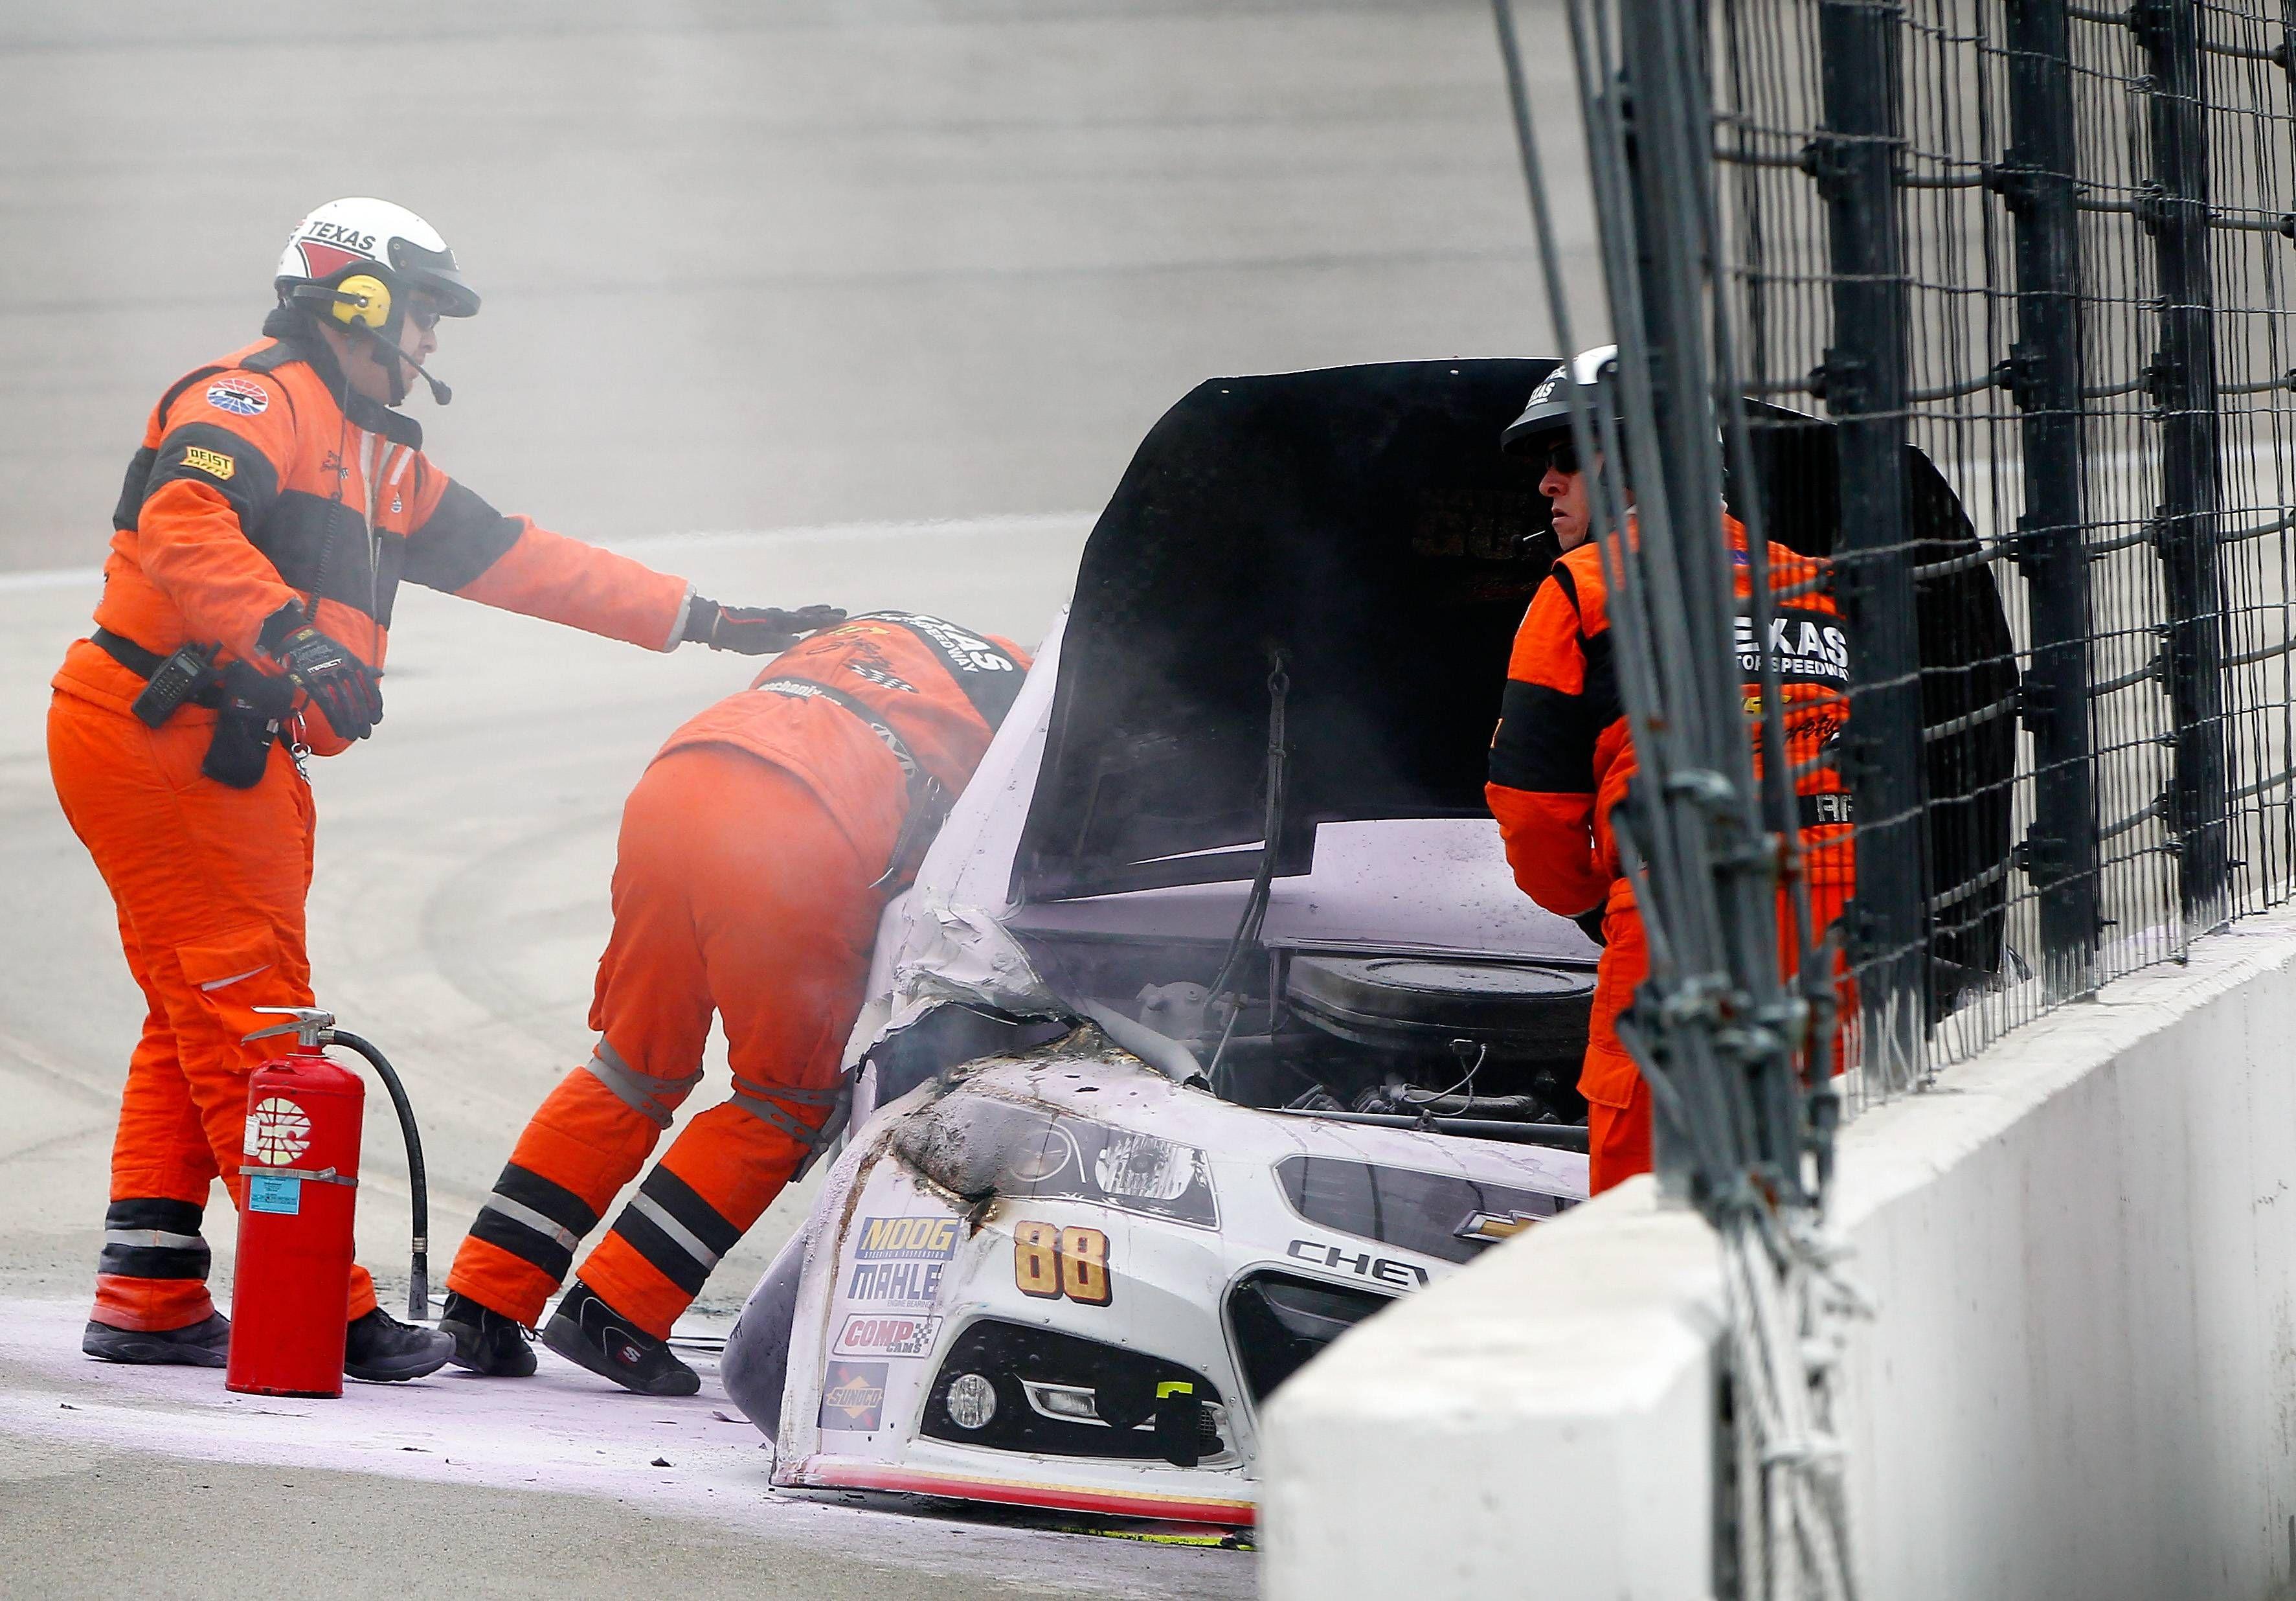 Dale earnhardt jr survives fiery tms crash wrecks